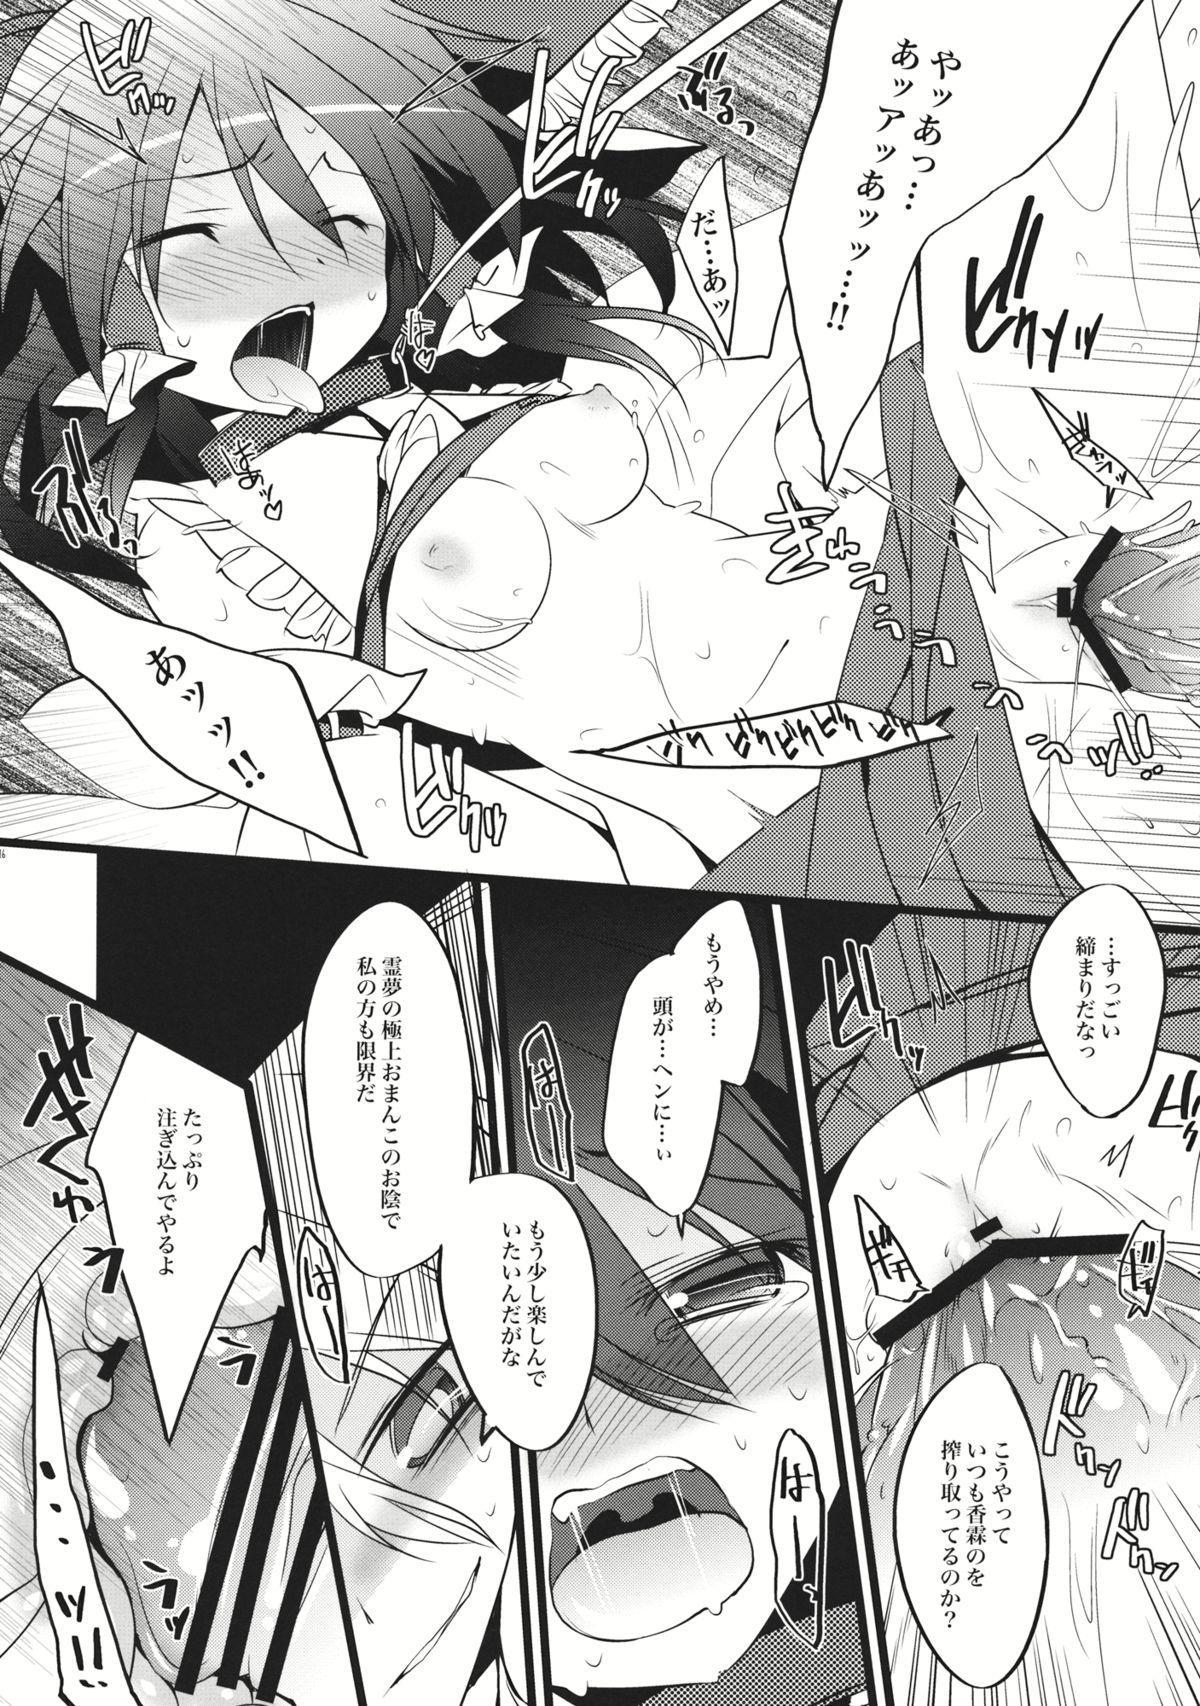 Kimi ni Hitsuyou na Nanika 14